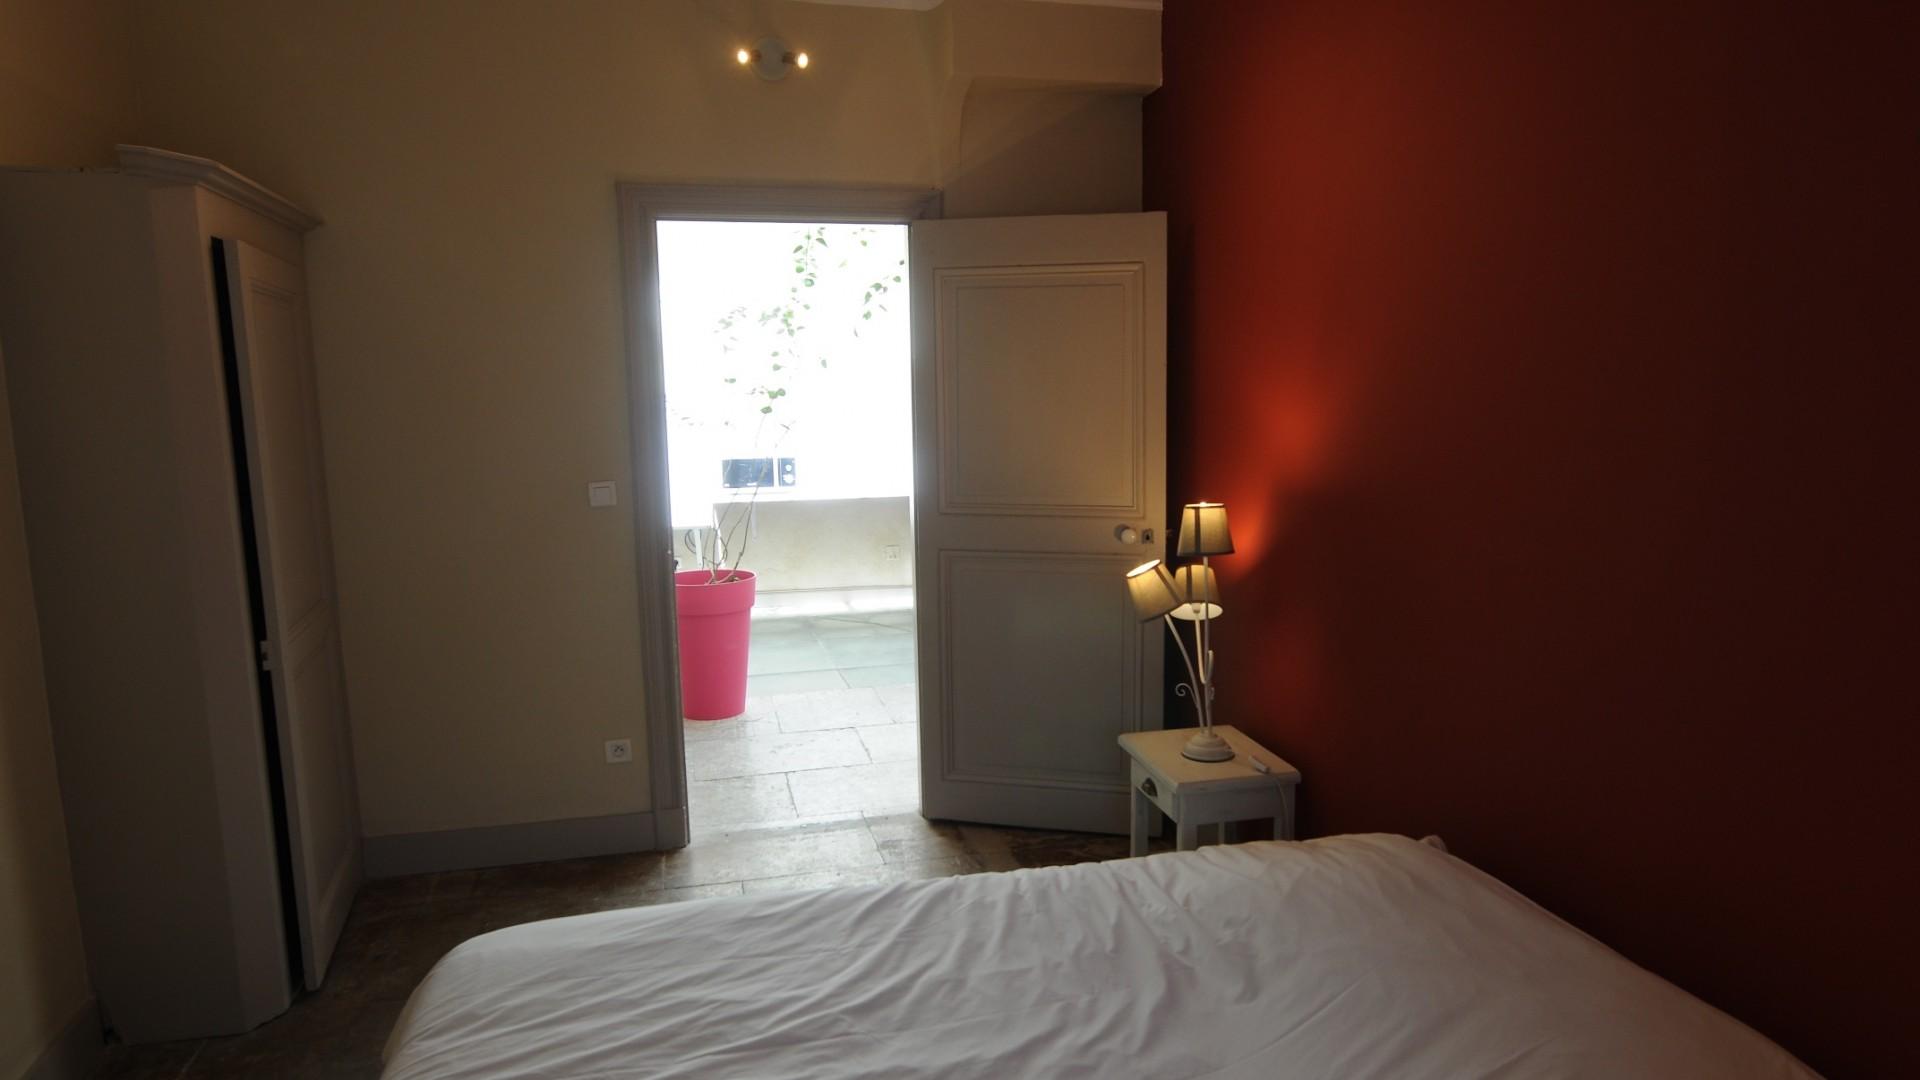 Bedroom on the corridor & courtyard